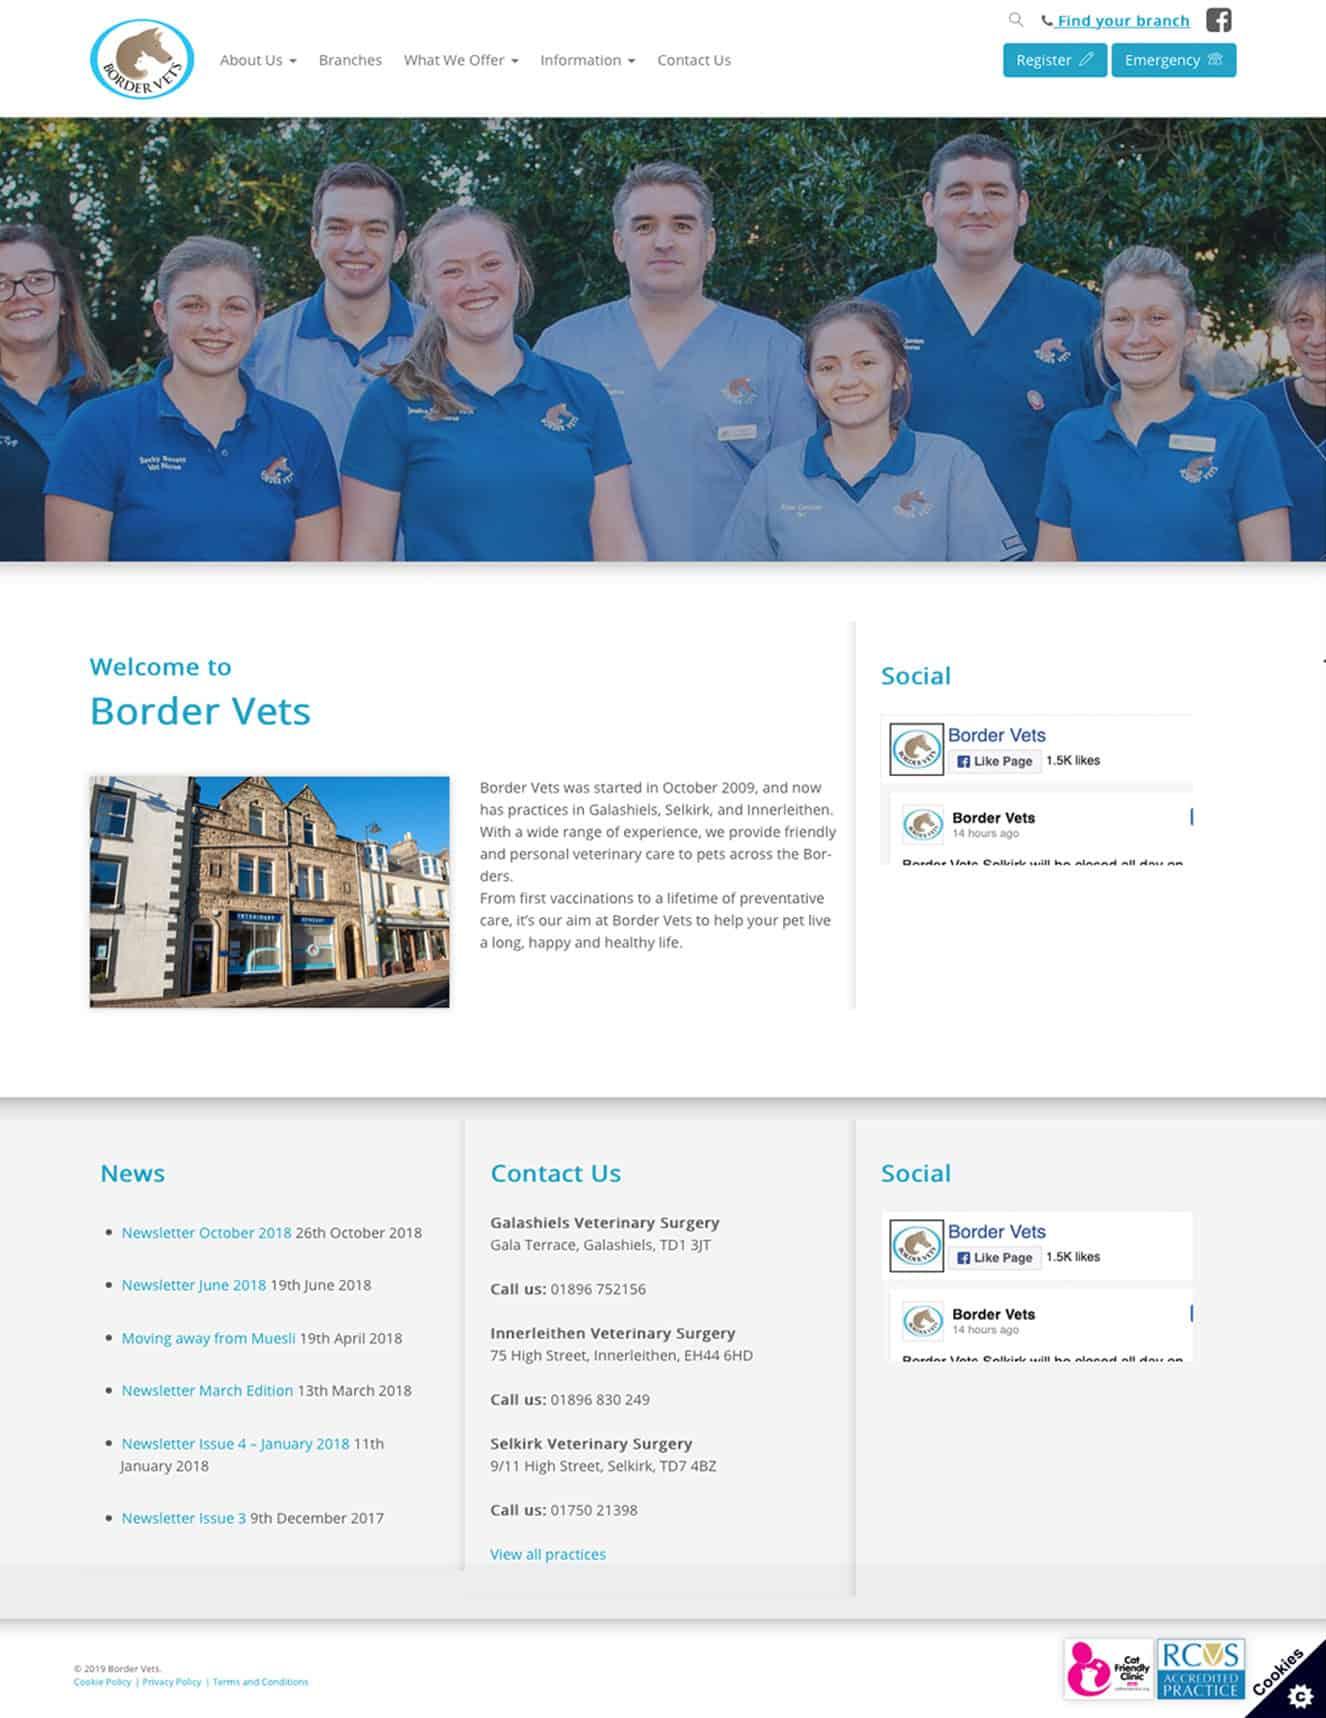 screenshot of border vets website on desktop